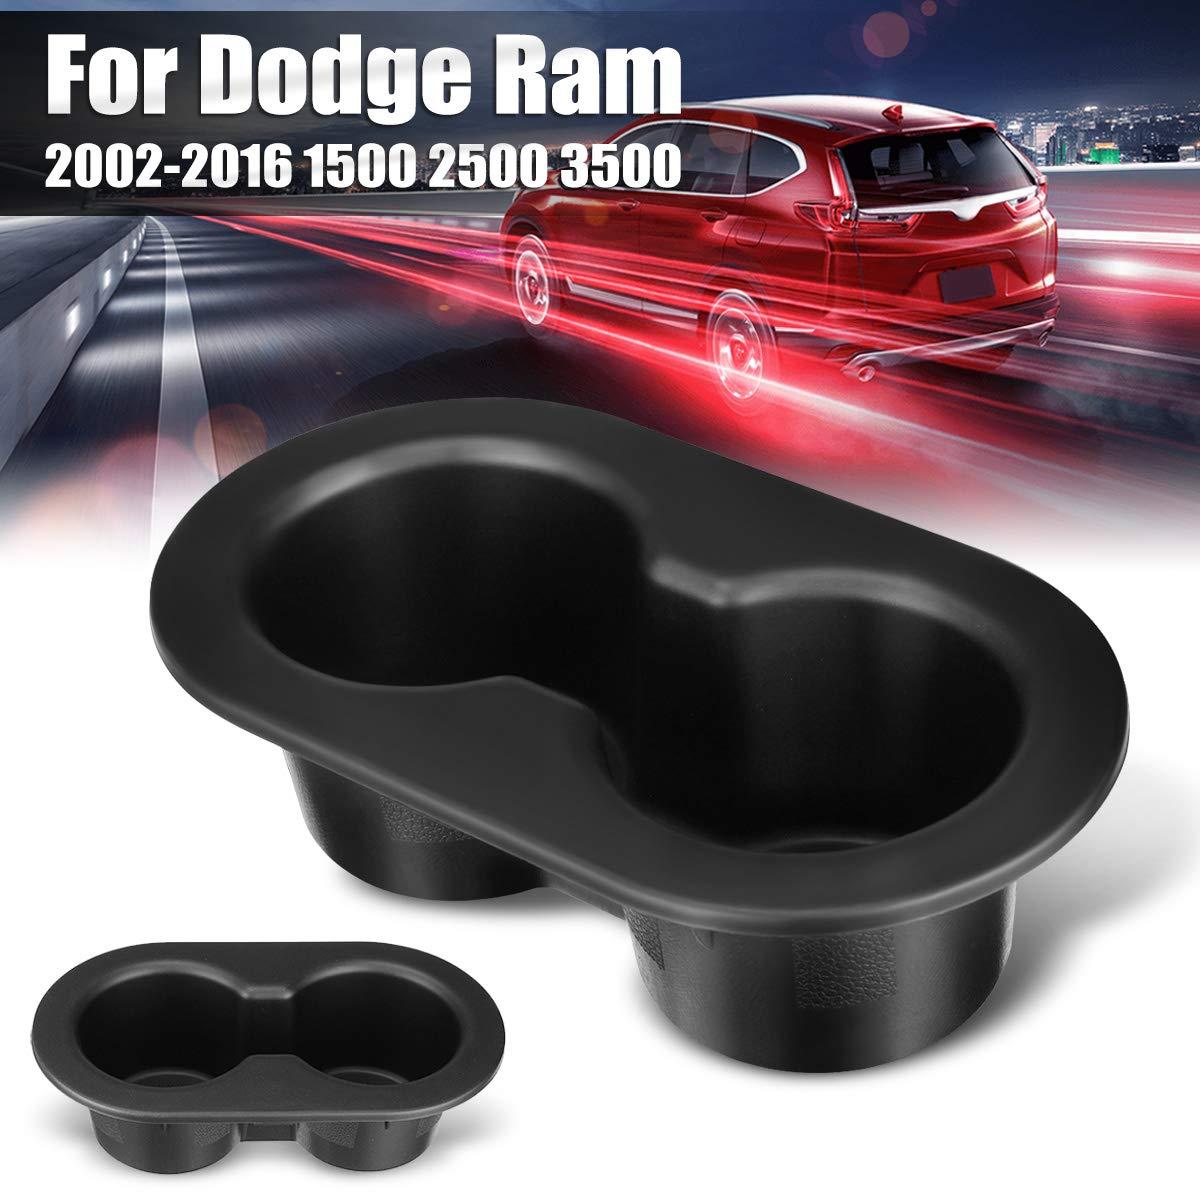 Rear Seat Storage Cup holder for Dodge Ram 2002-2016 1500 2500 3500 Black